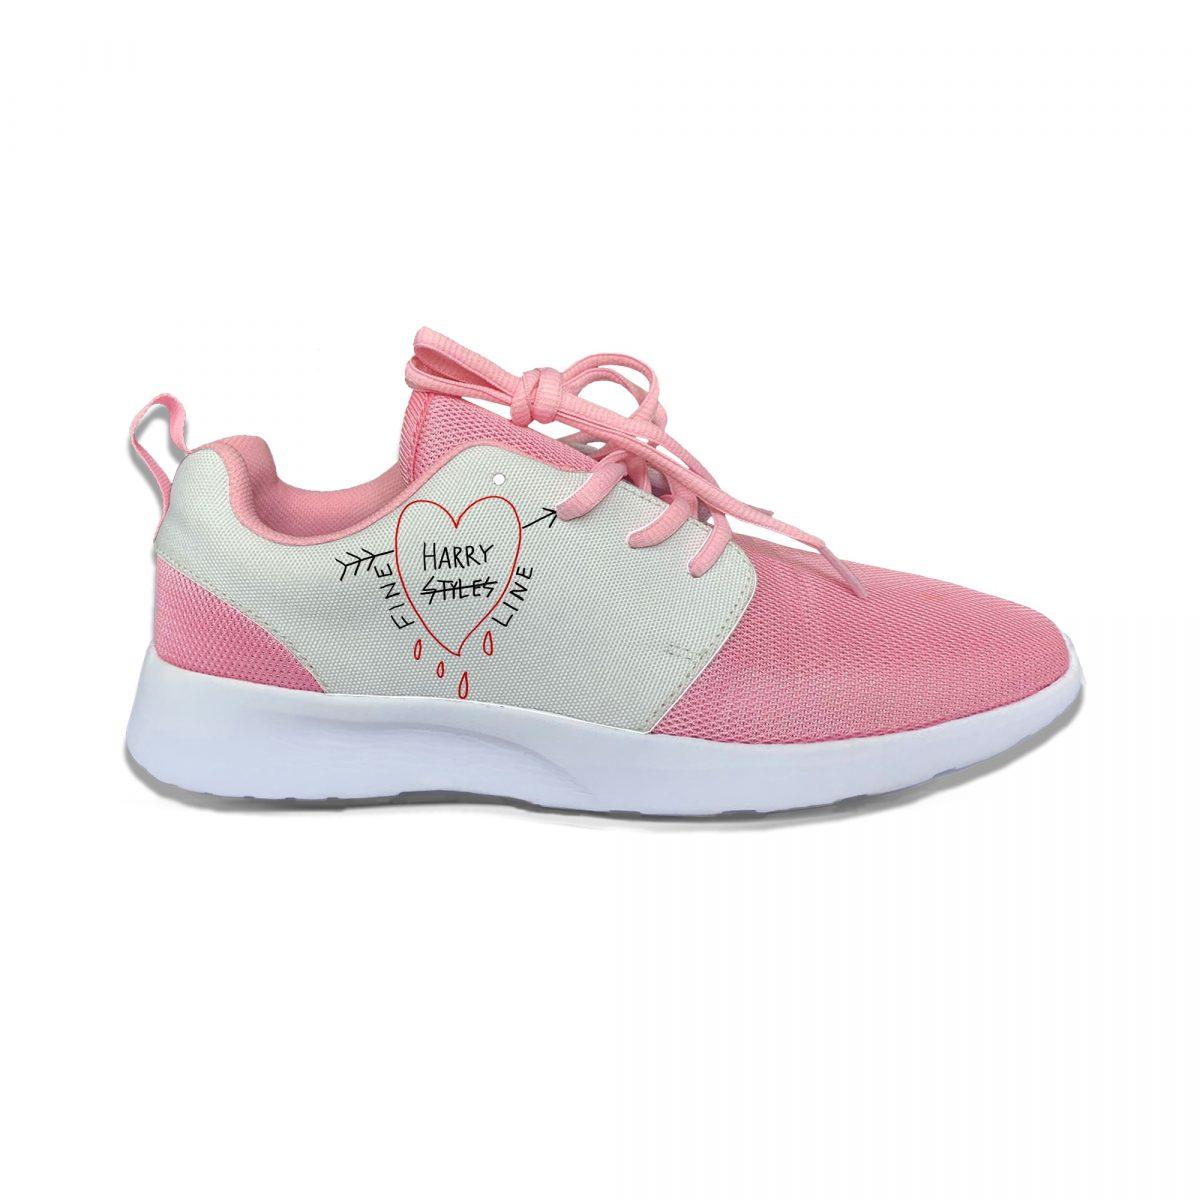 Harry Styles Fine Line Sport Shoes